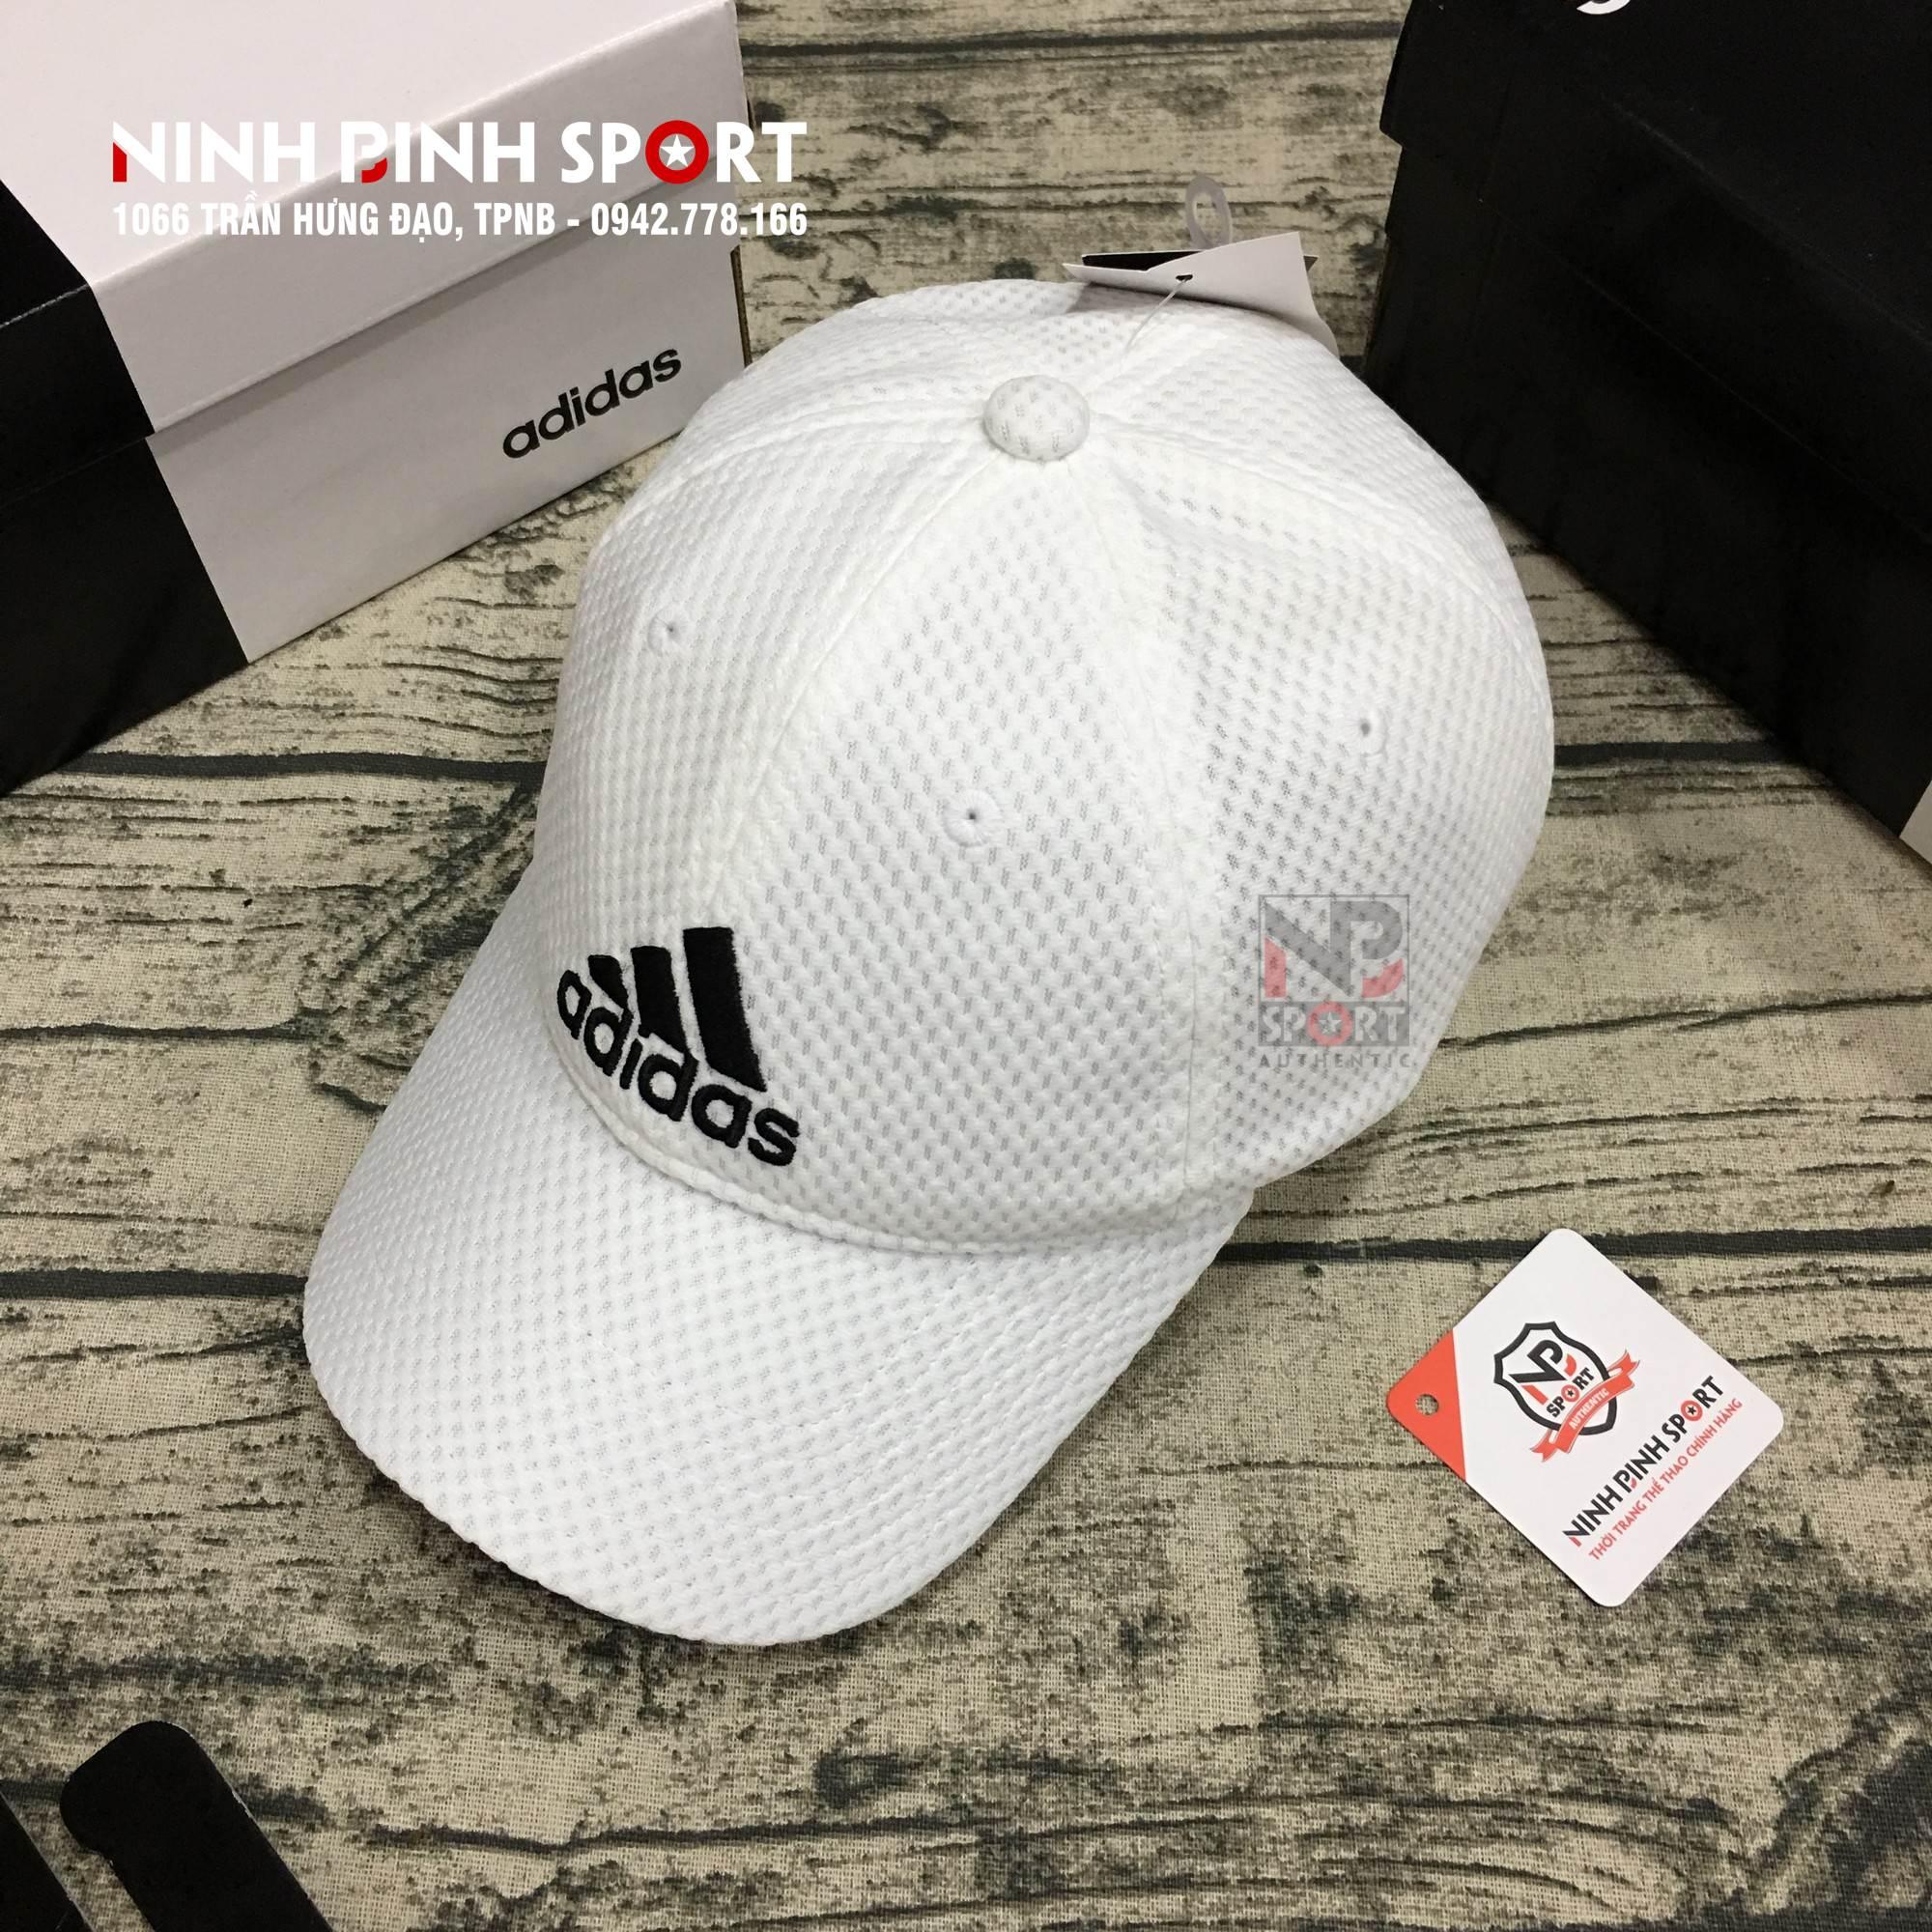 Mũ thể thao Adidas C40 Climacool White CG1787